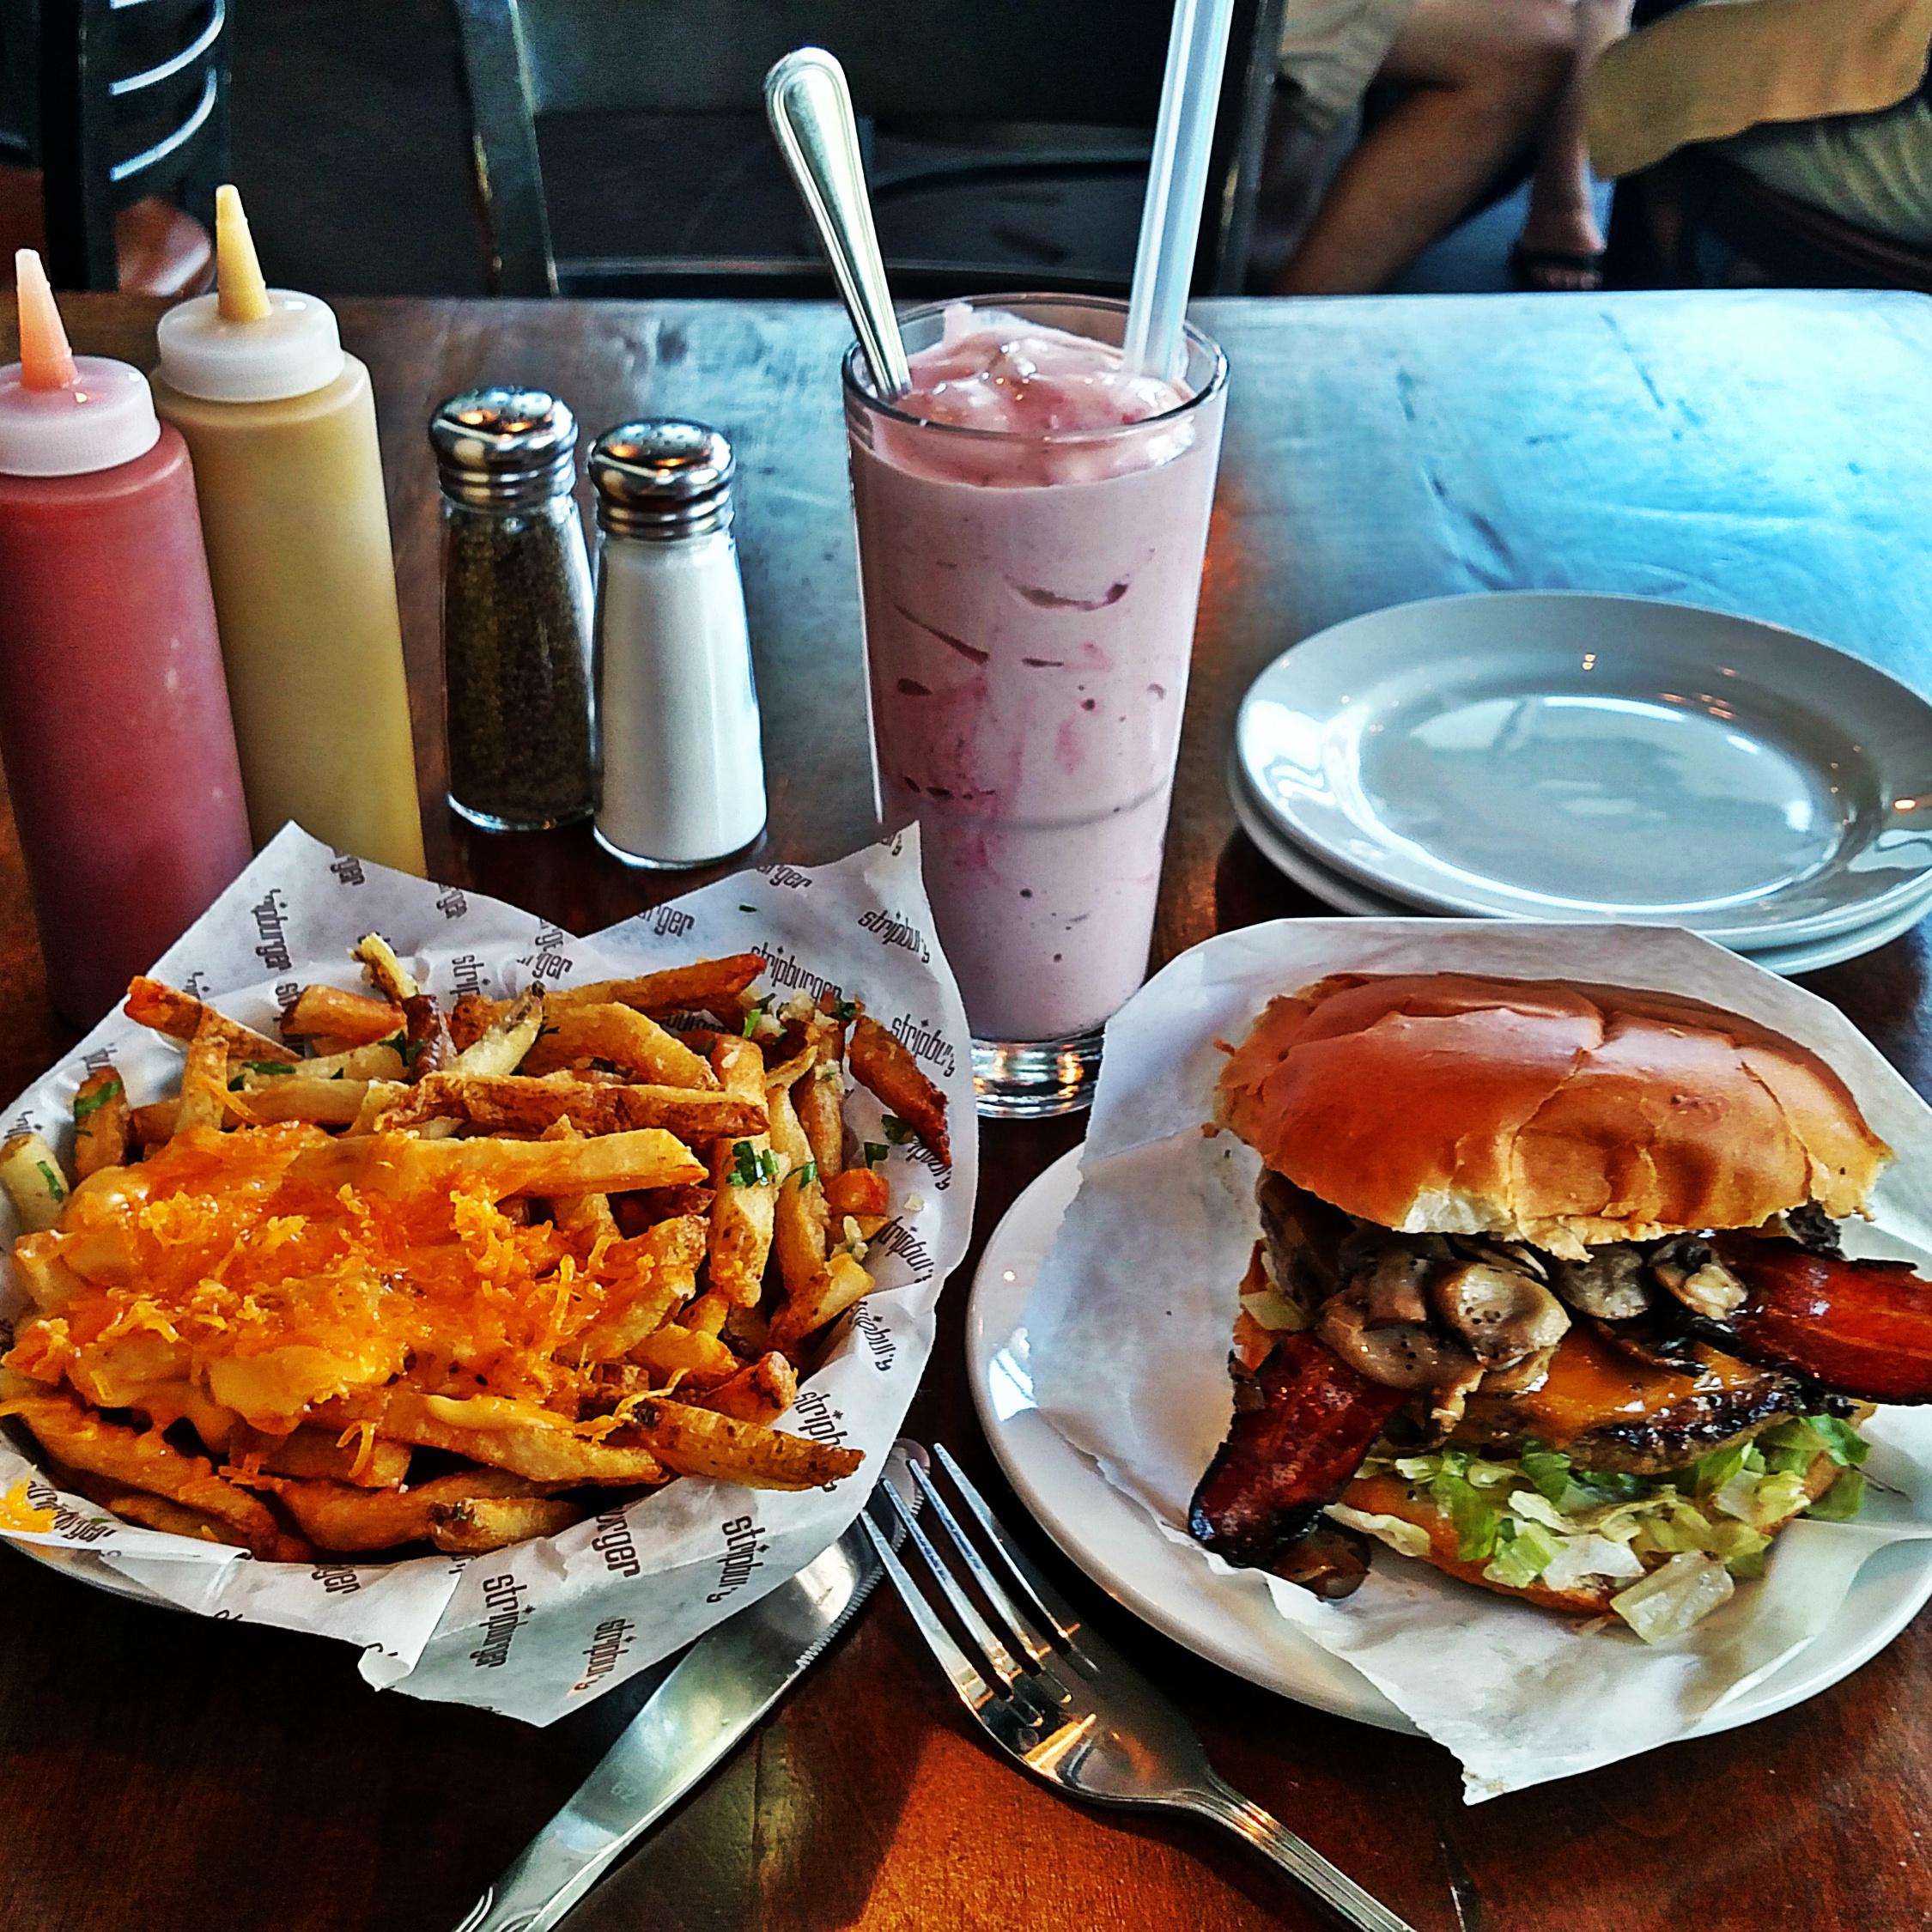 California Pizza Kitchen Marina Del Rey: Las Vegas, NV: Bacon & Cheddar Burger W